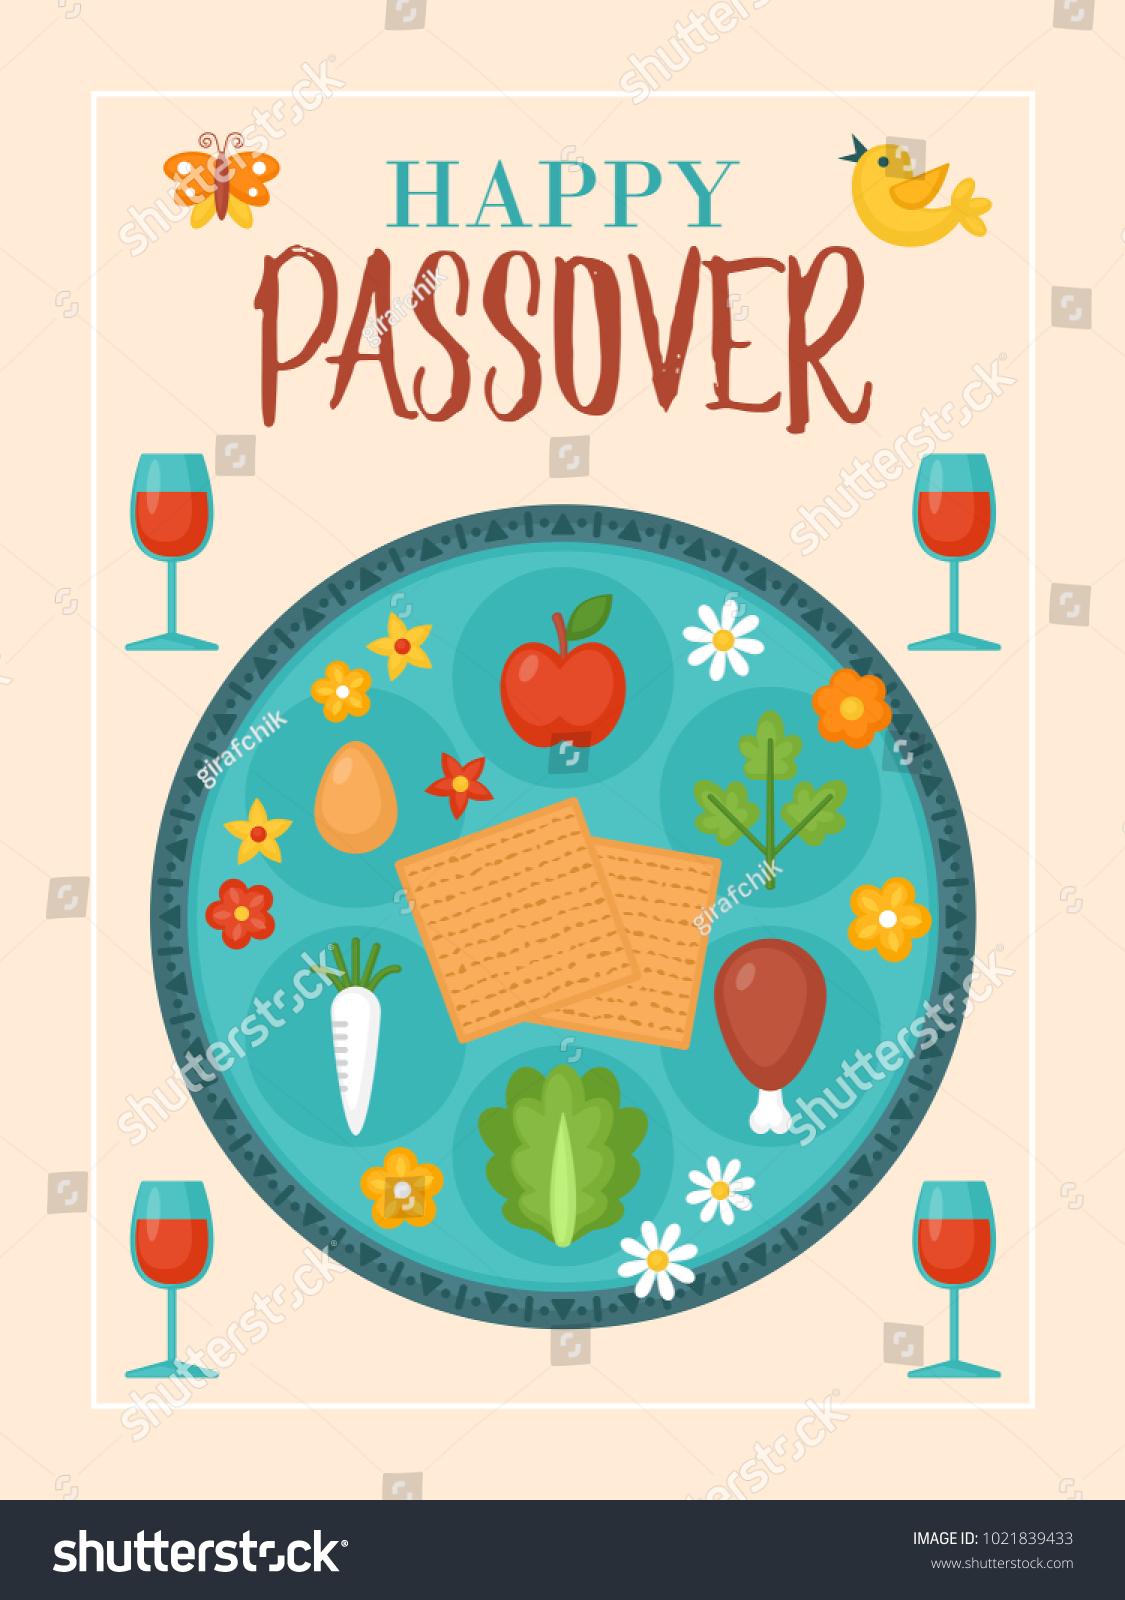 Passover holiday greeting card design seder stock vector passover holiday greeting card design with seder plate and matzo buycottarizona